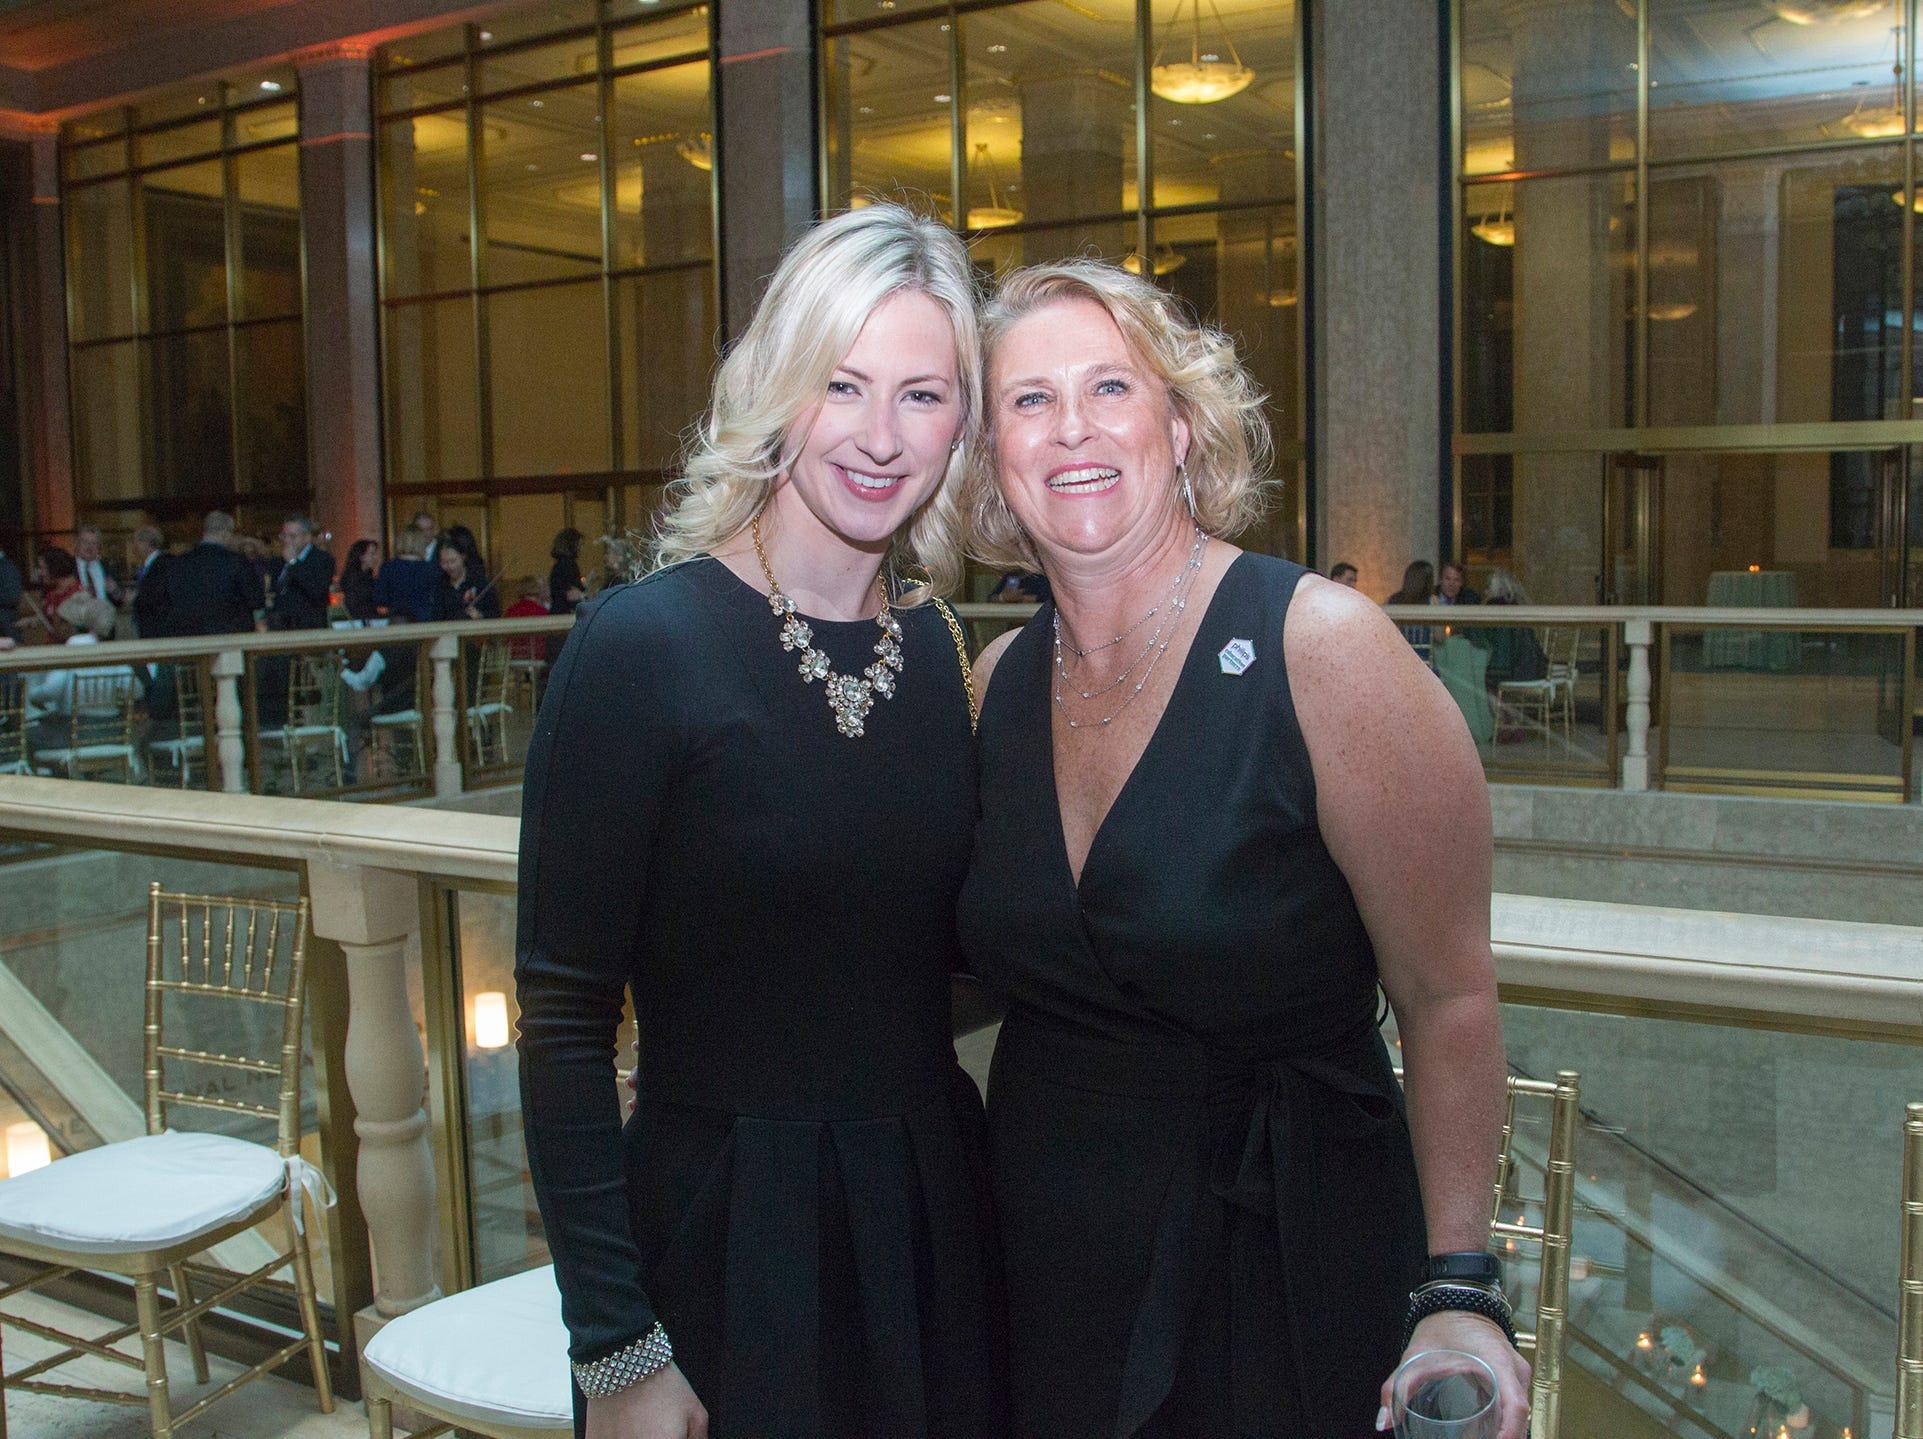 Karen San Giacomo, Cheryl Lowe( Co-Chair). Philip's Education Partners host The Dream Maker 30th anniversary gala at The Mezzanine in Newark 3/29/2019.